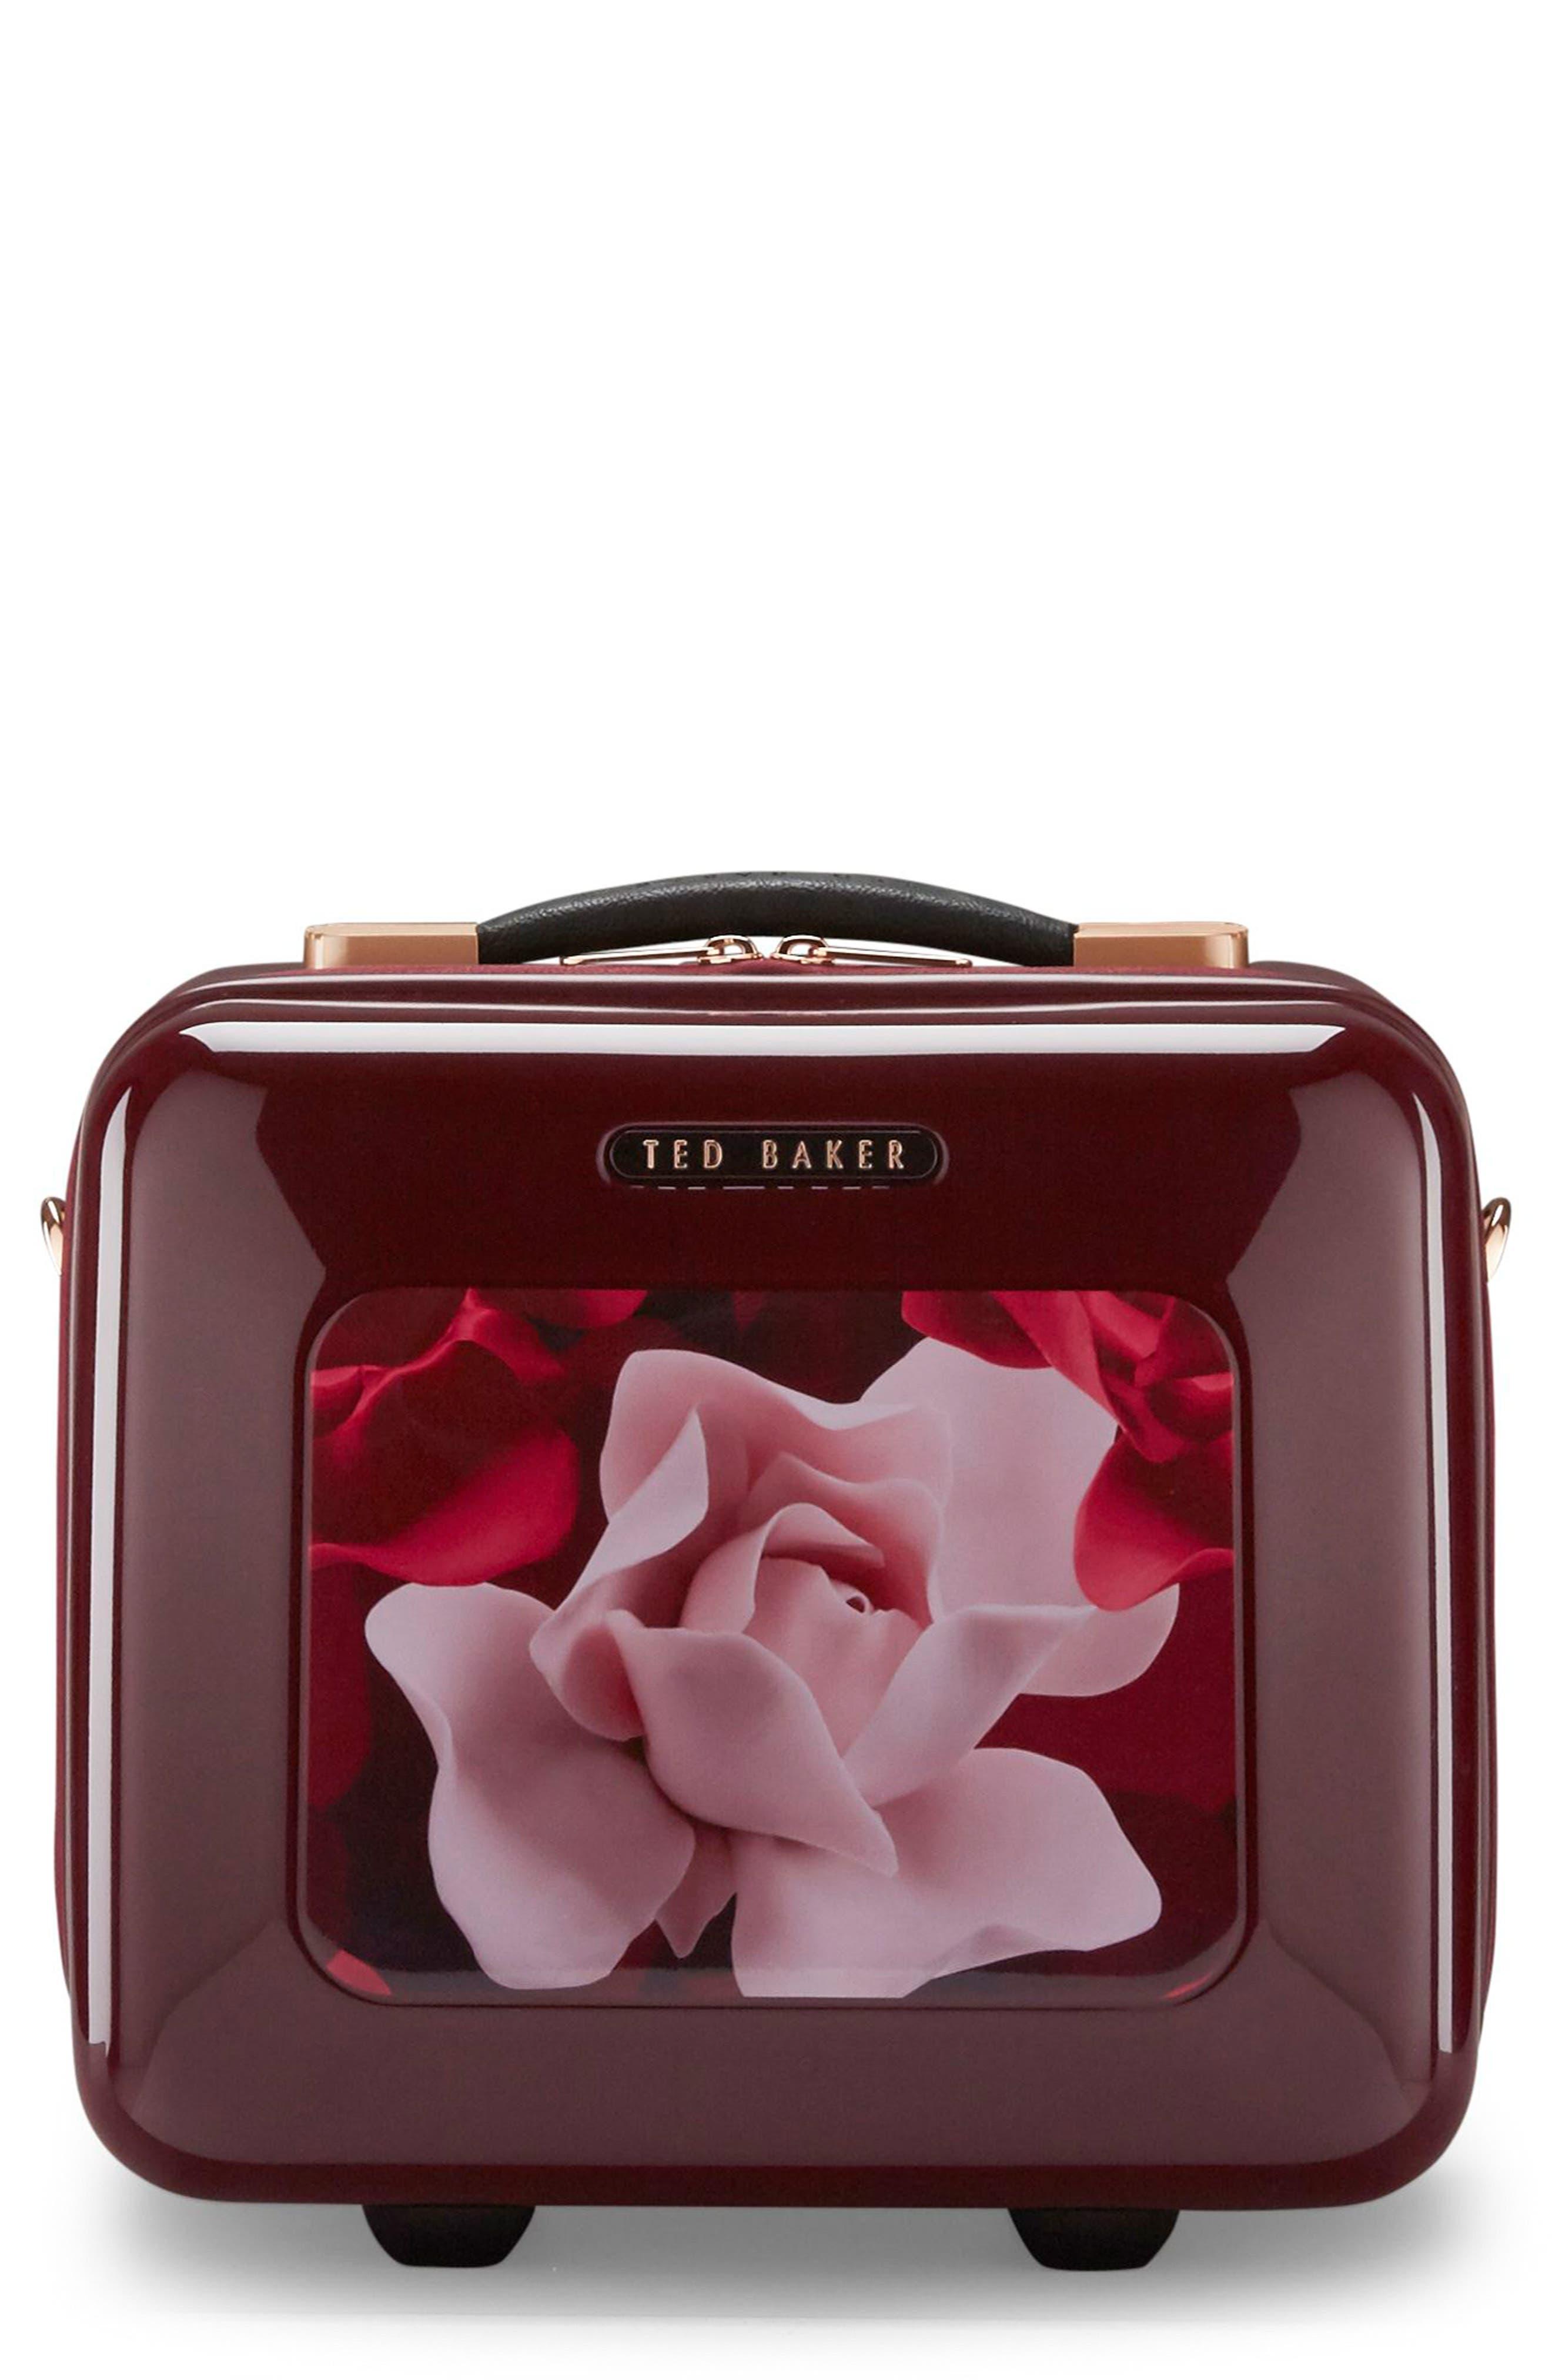 Porcelain Rose Vanity Case,                             Main thumbnail 1, color,                             Burgundy